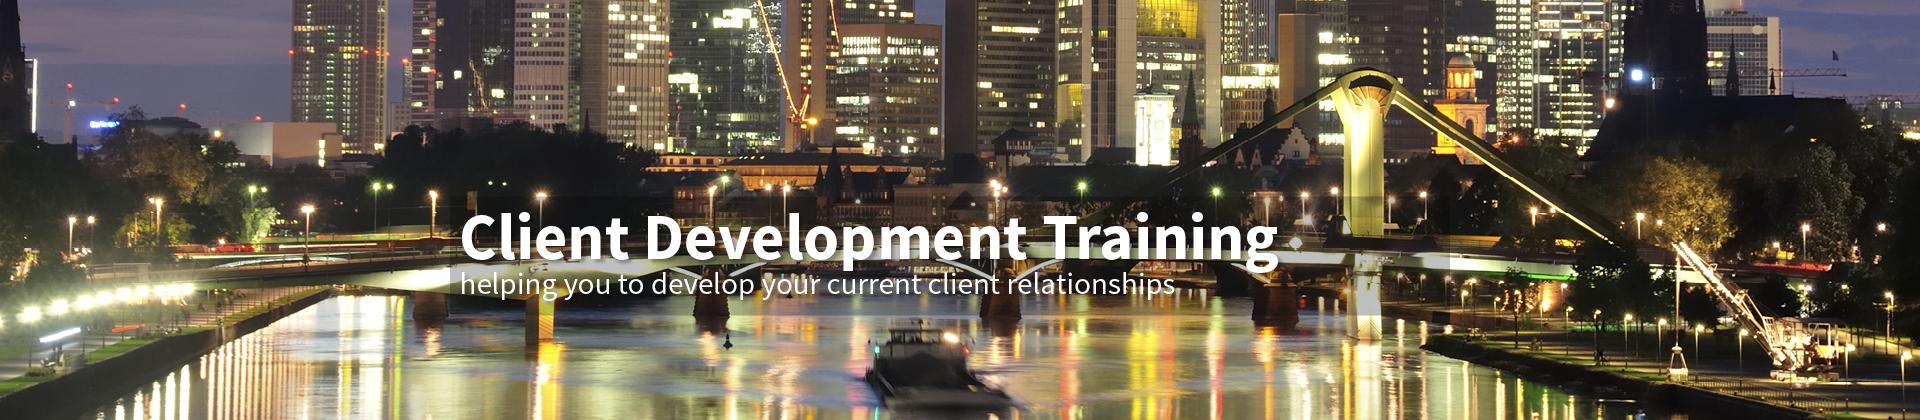 Client Development Training